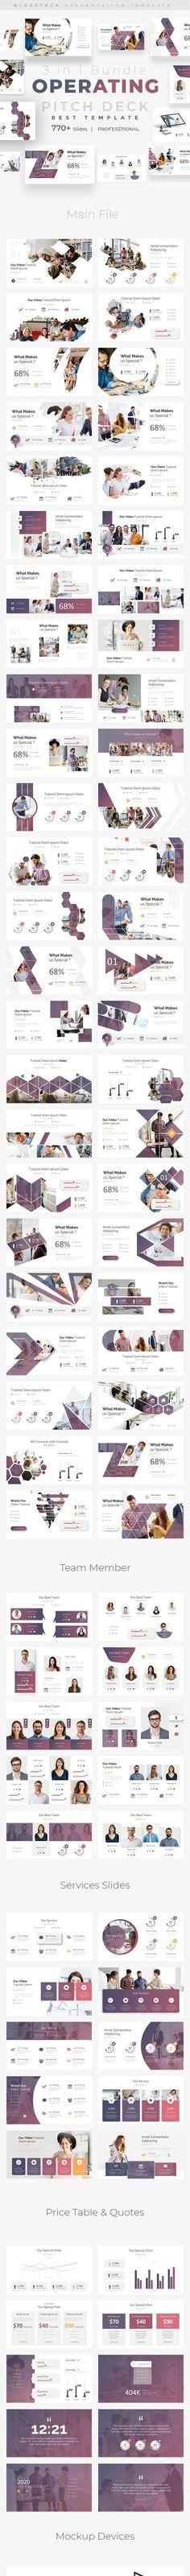 Operating Pitch Deck 3 in 1 Bundle Keynote Template Business Presentation by bluestack. Business Presentation Templates, Business Powerpoint Templates, Presentation Design, Keynote Template, Pitch Deck, Branding Design, Graphic Design, Creative, Brand Design